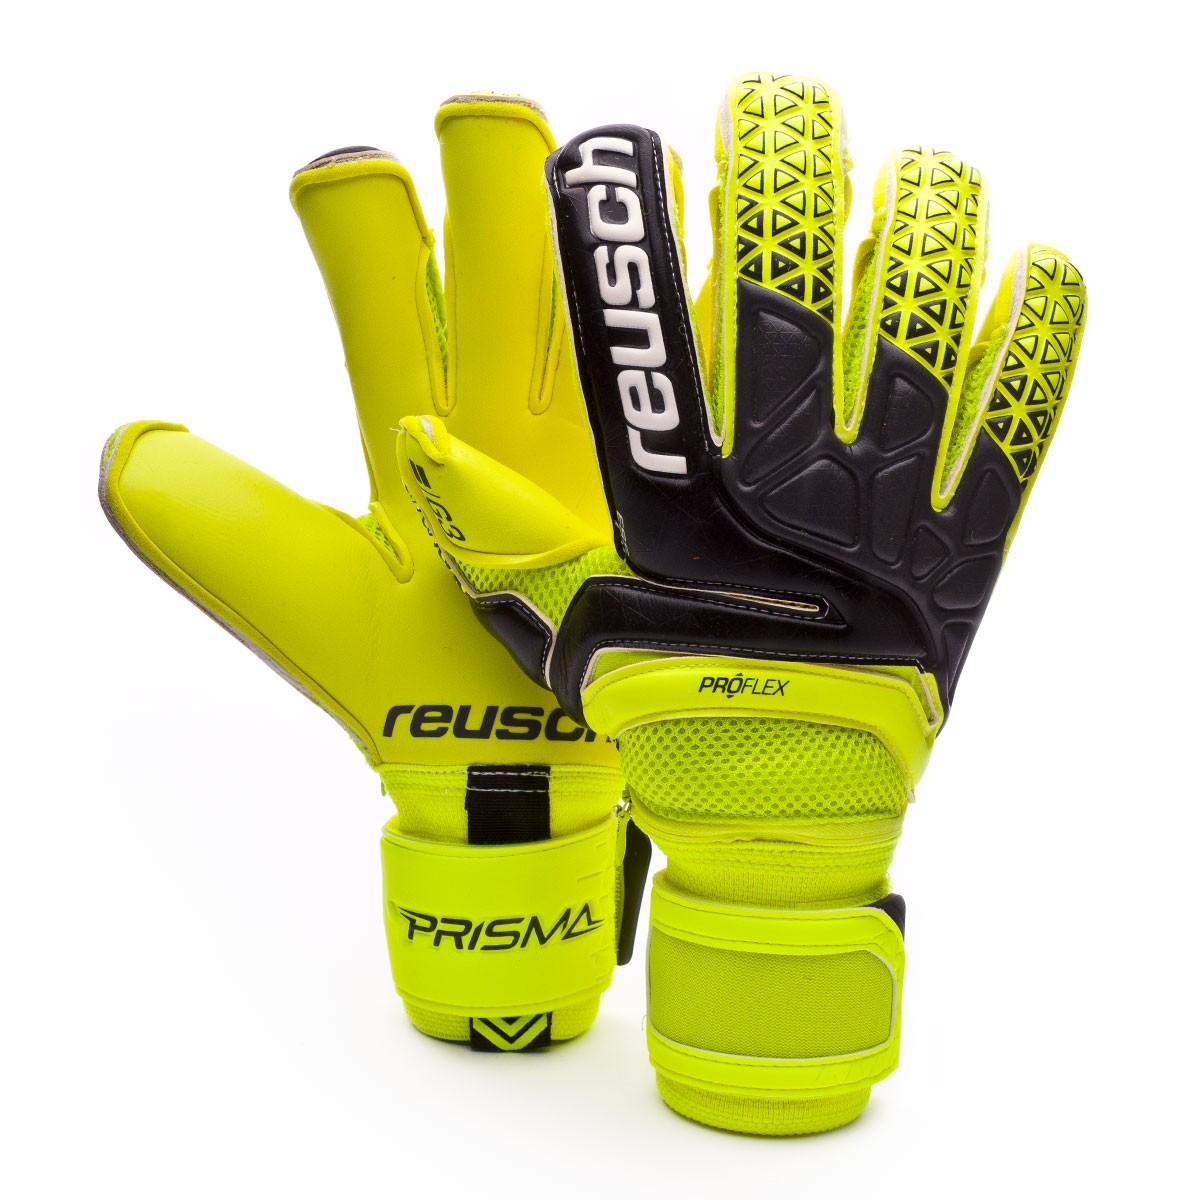 44dcc021df16c Guante de portero Reusch Prisma Pro G3 Evolution Ortho-Tec Safety  yellow-Black-Safety yellow - Tienda de fútbol Fútbol Emotion